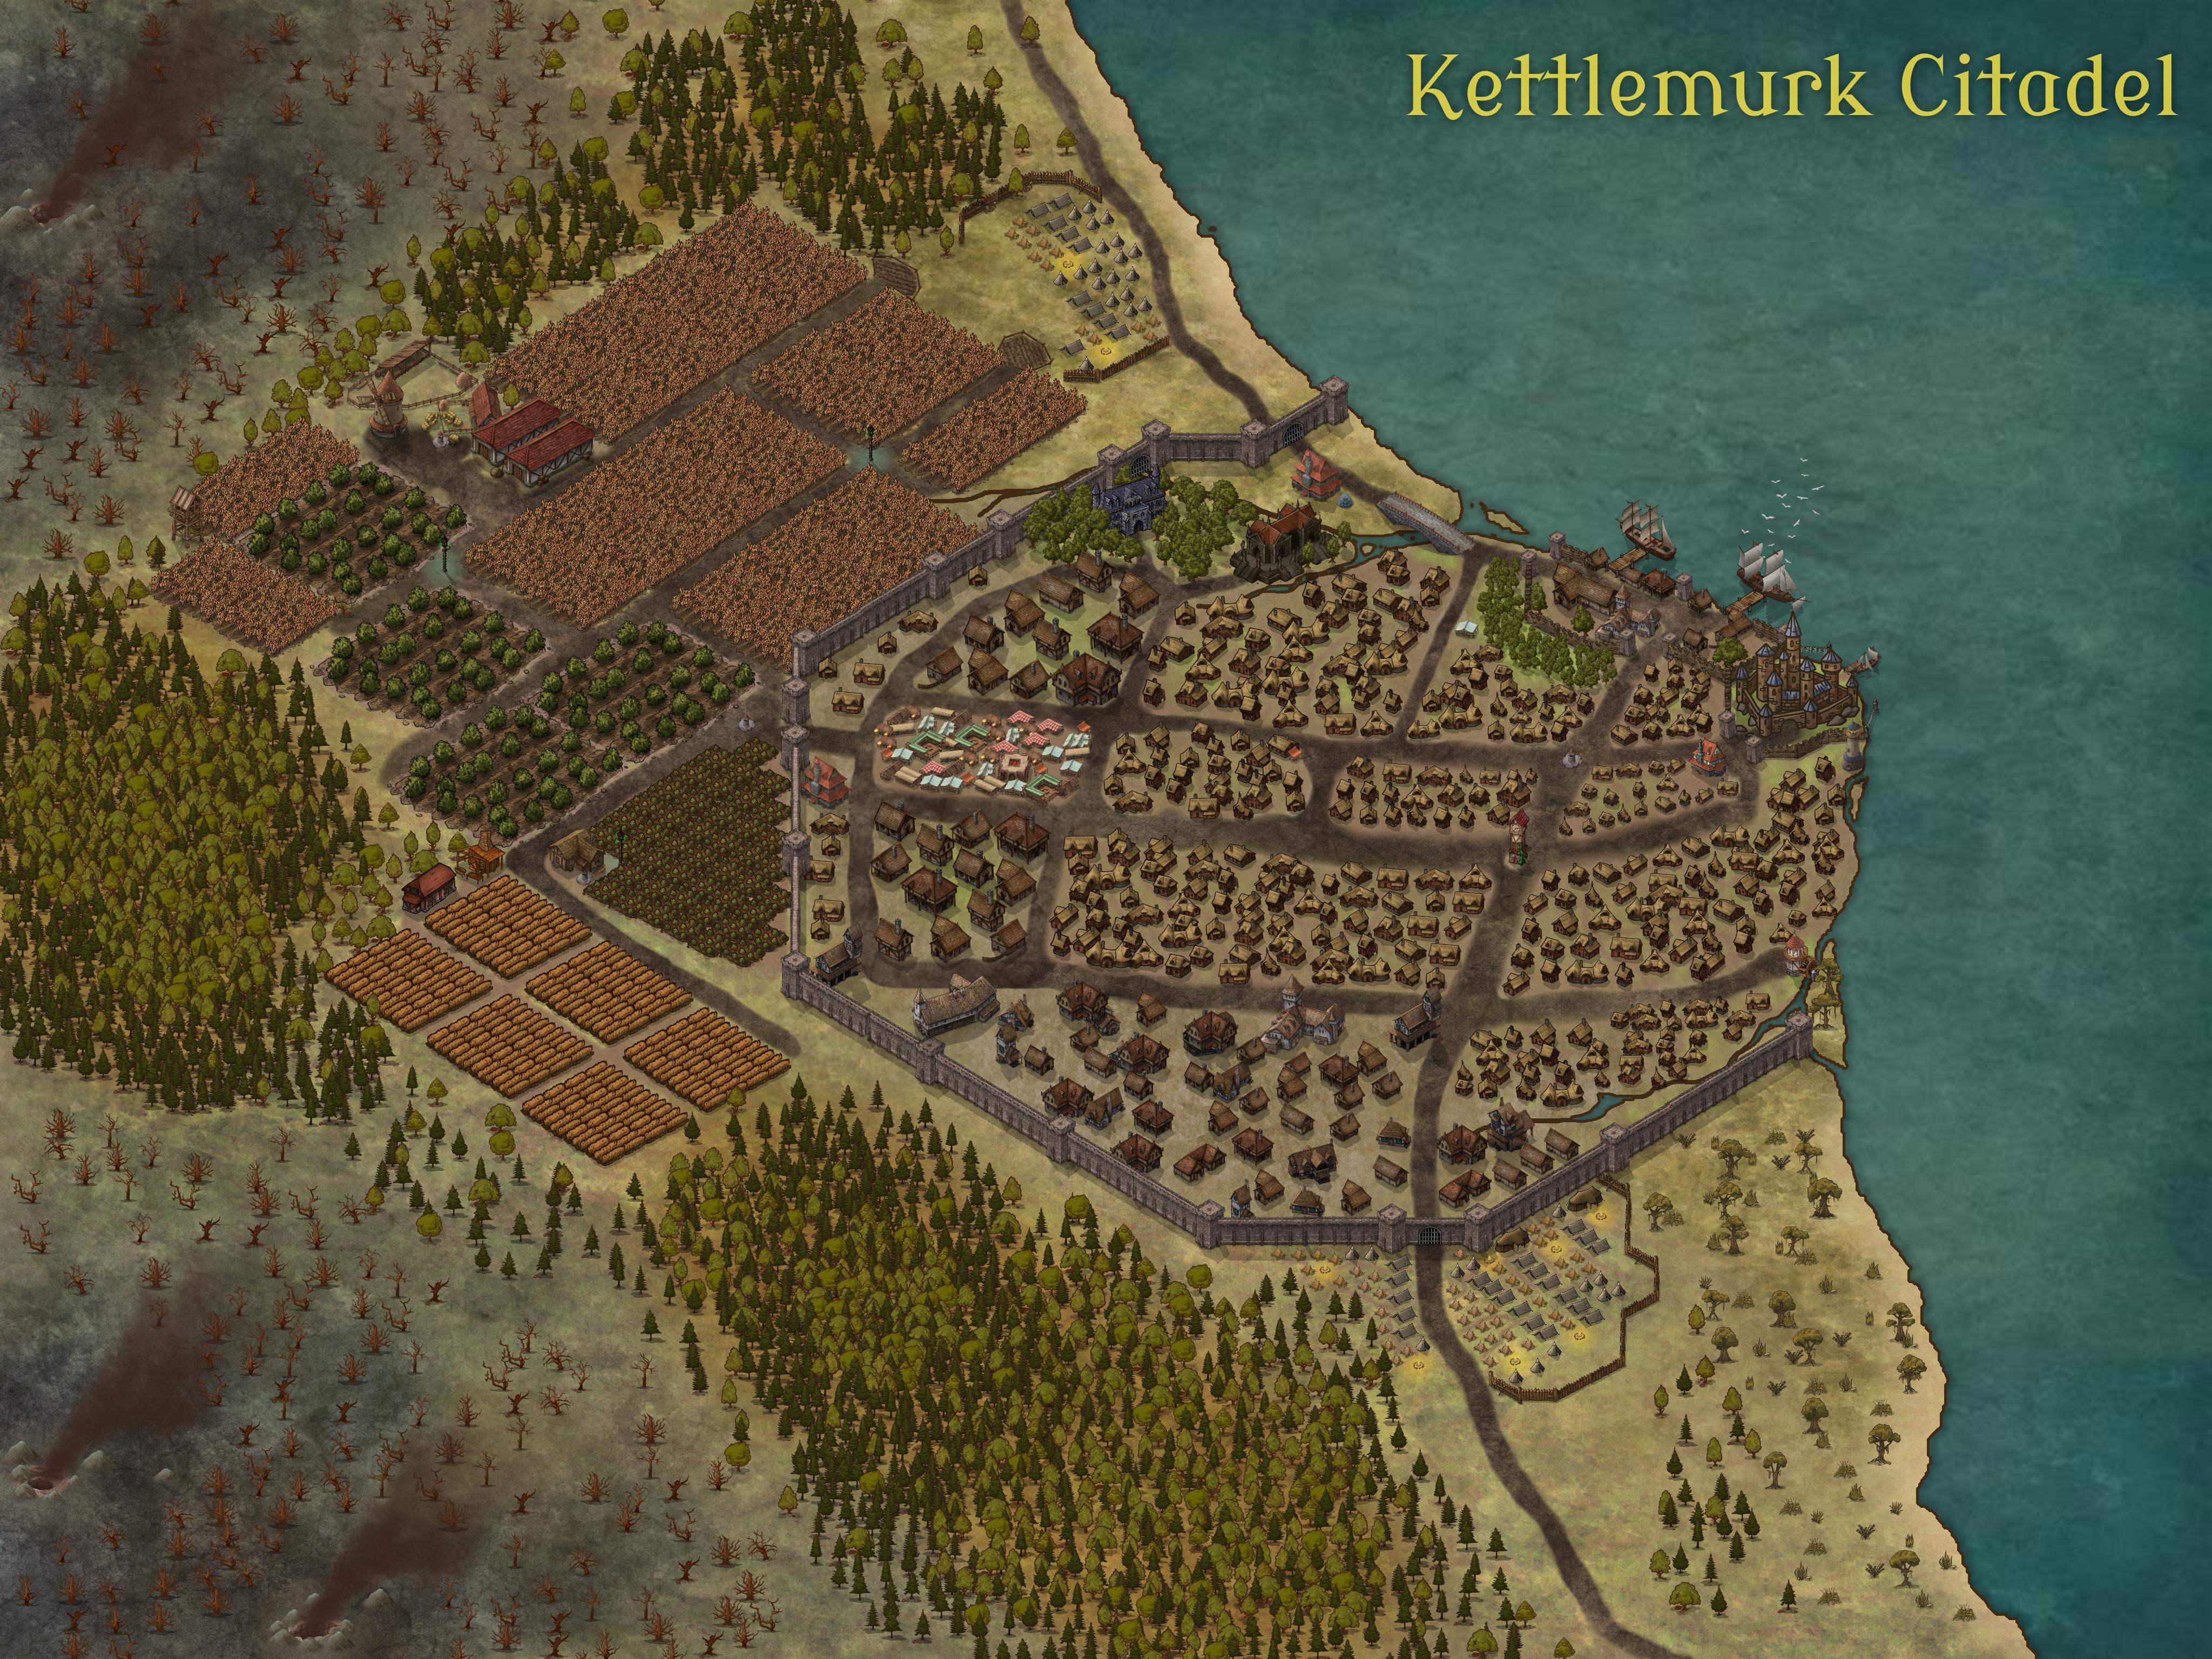 Kettlemurk_Citadel-1.png